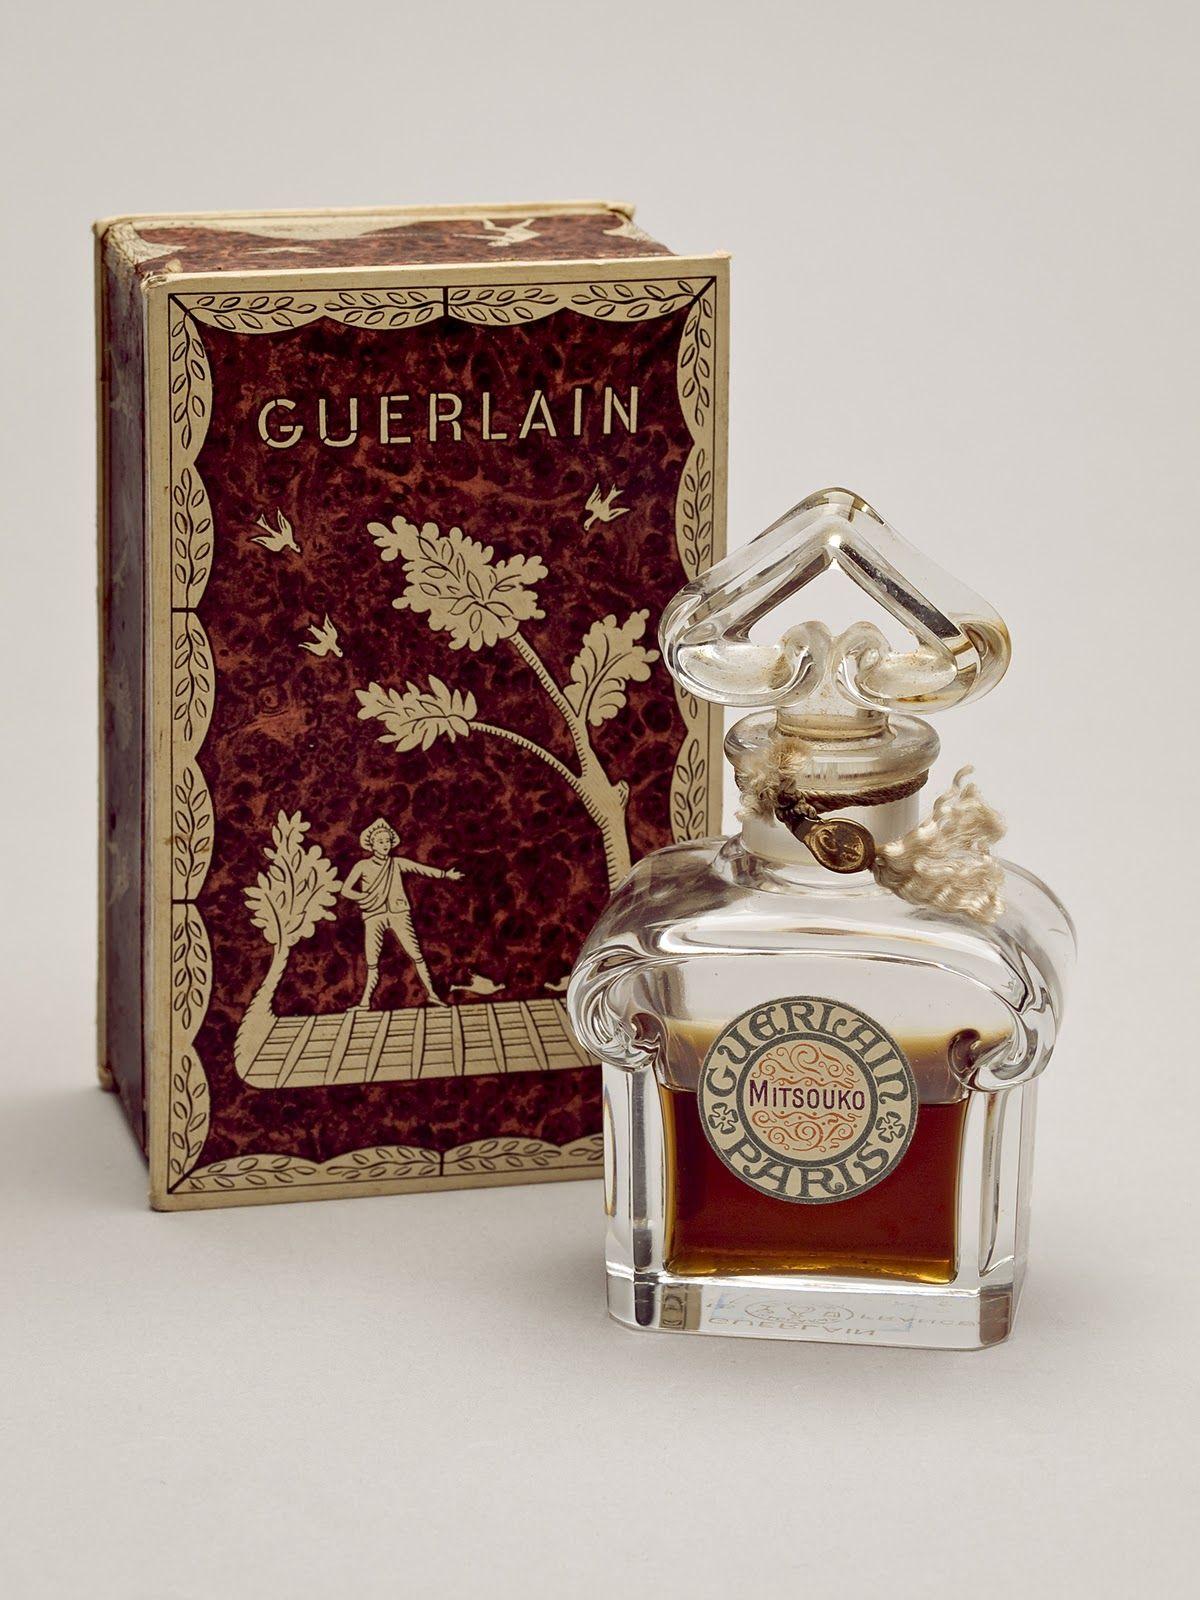 Pin By Tiziana Gra On Guerlain Perfume Antique Perfume Bottles